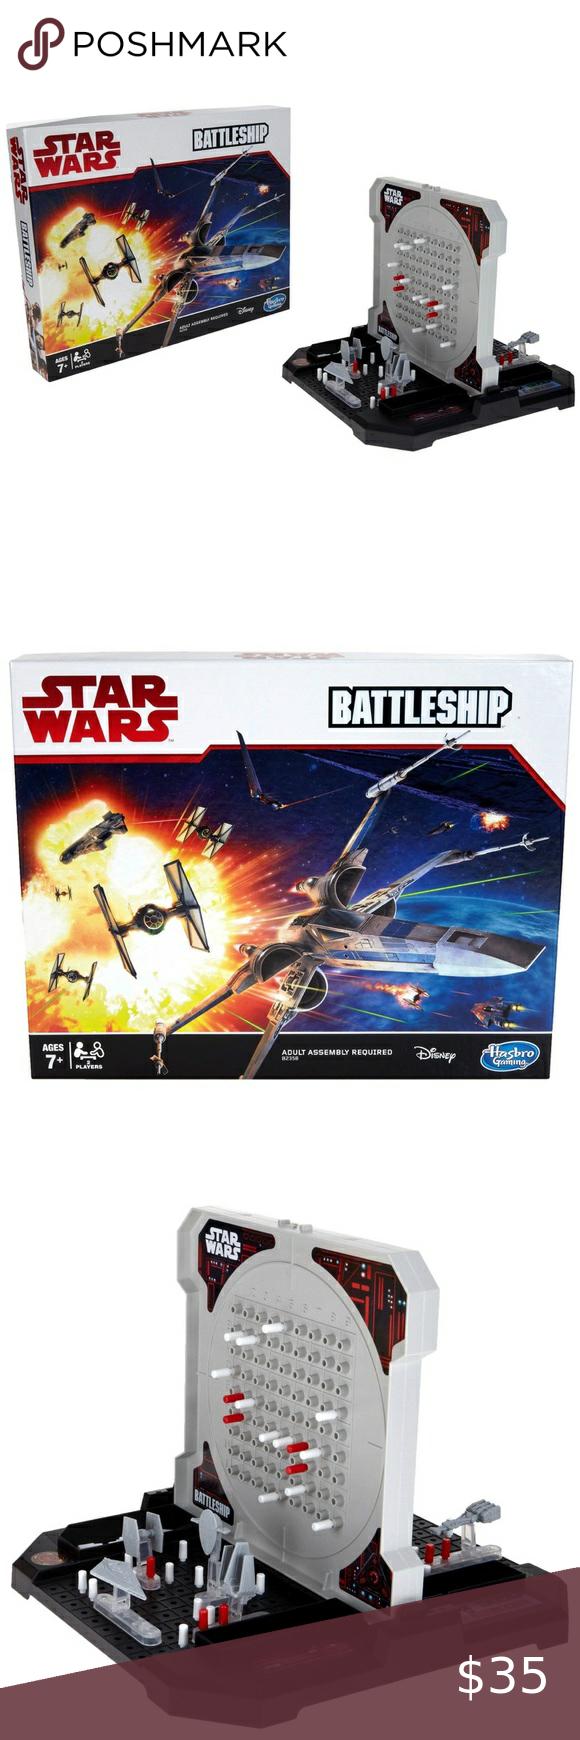 NEW Hasbro Battleship Game Star Wars Edition in 2020